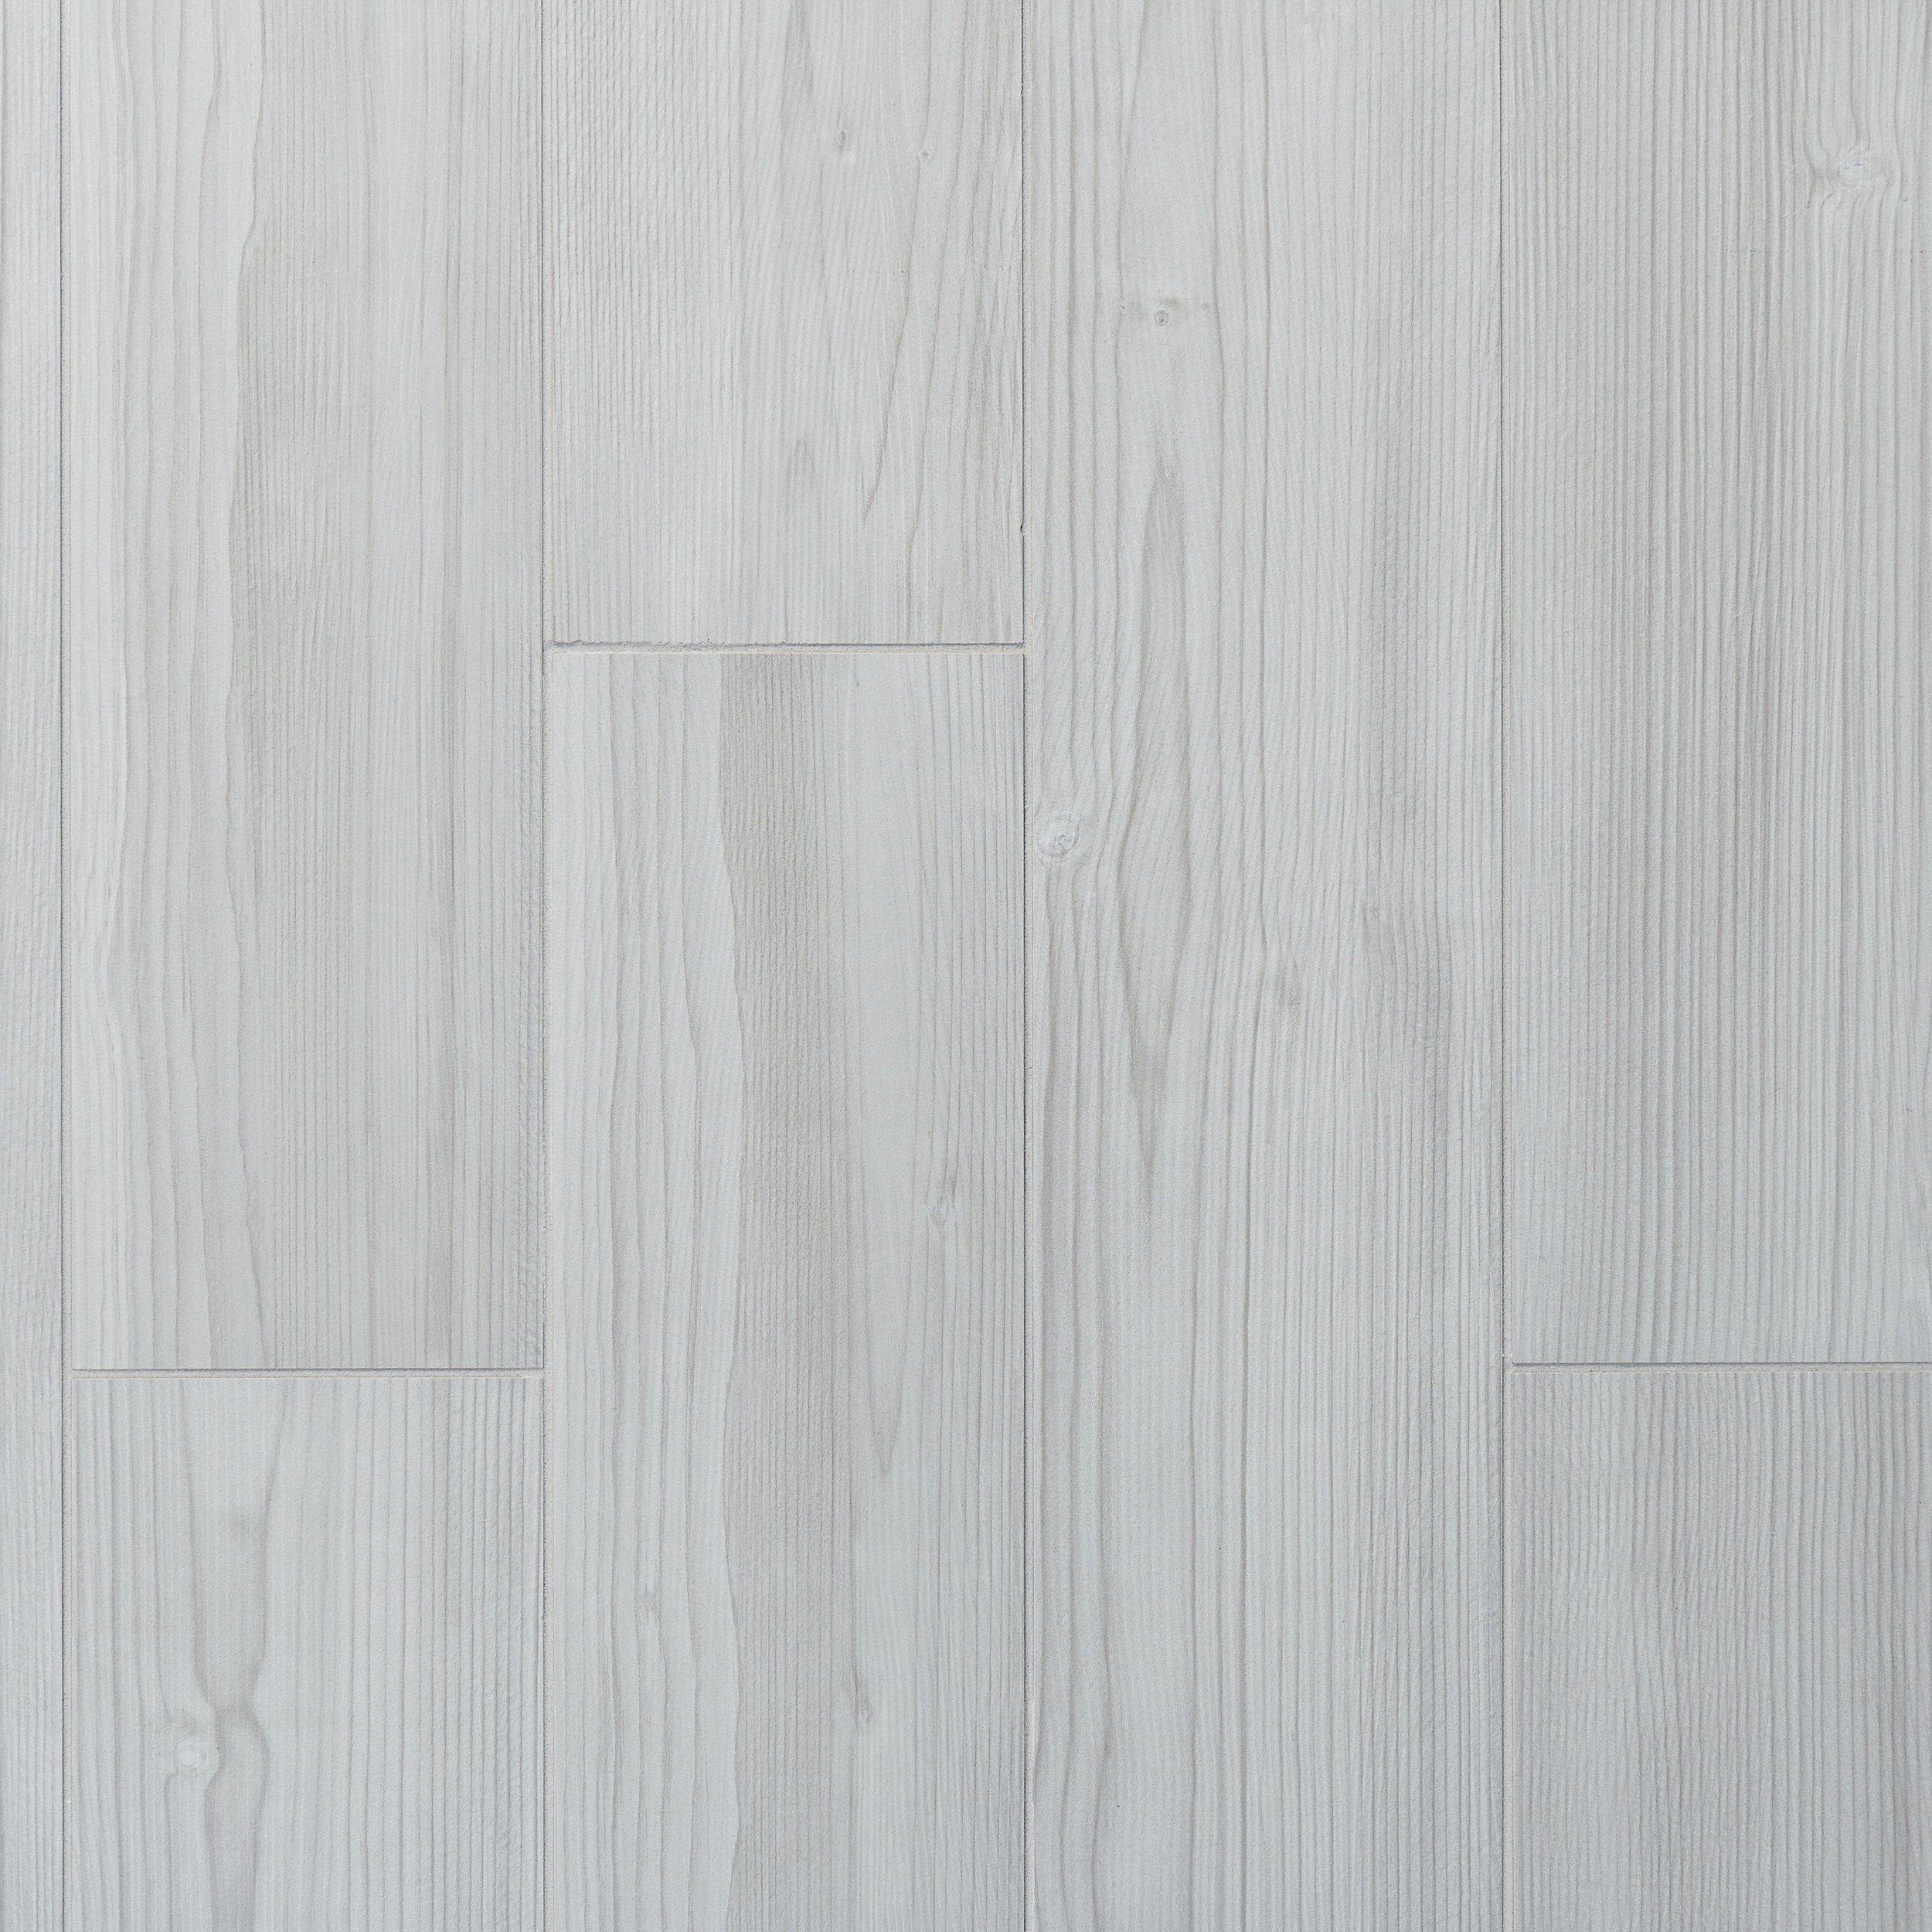 Concrete Gray Ceramic Tile 12 X 24 100136795 Floor